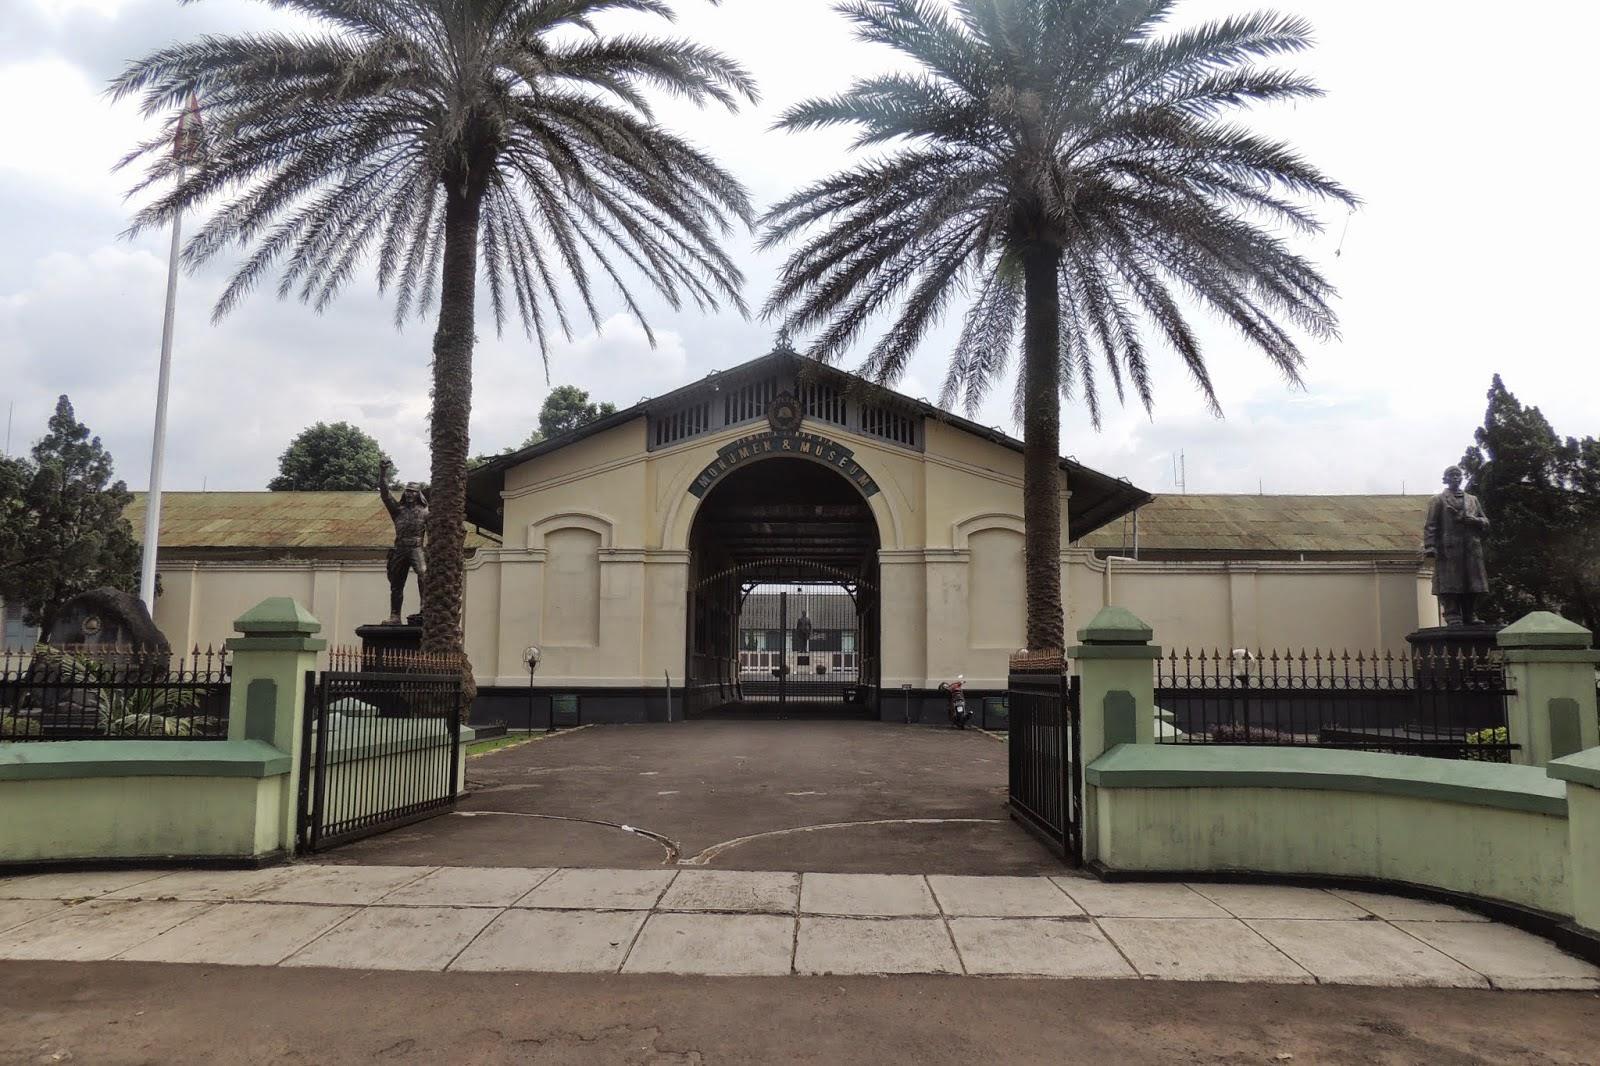 Wisata Sejarah Bogor Jawa Barat Museum Pembela Tanah Air Https